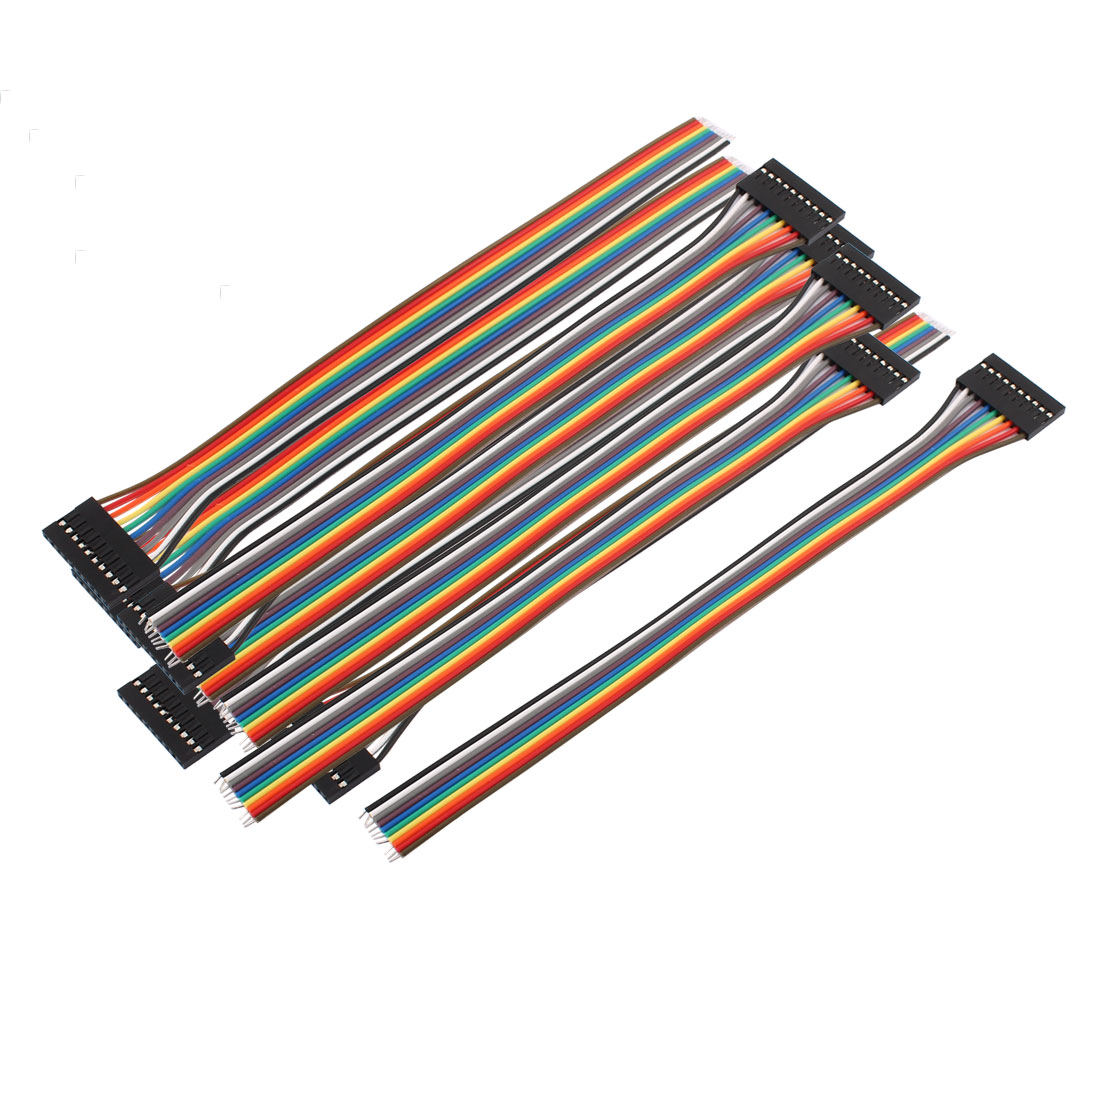 10 Pcs 10P Jumper Wires Female Ribbon Cables Pi Pic Breadboard DIY 20cm Long